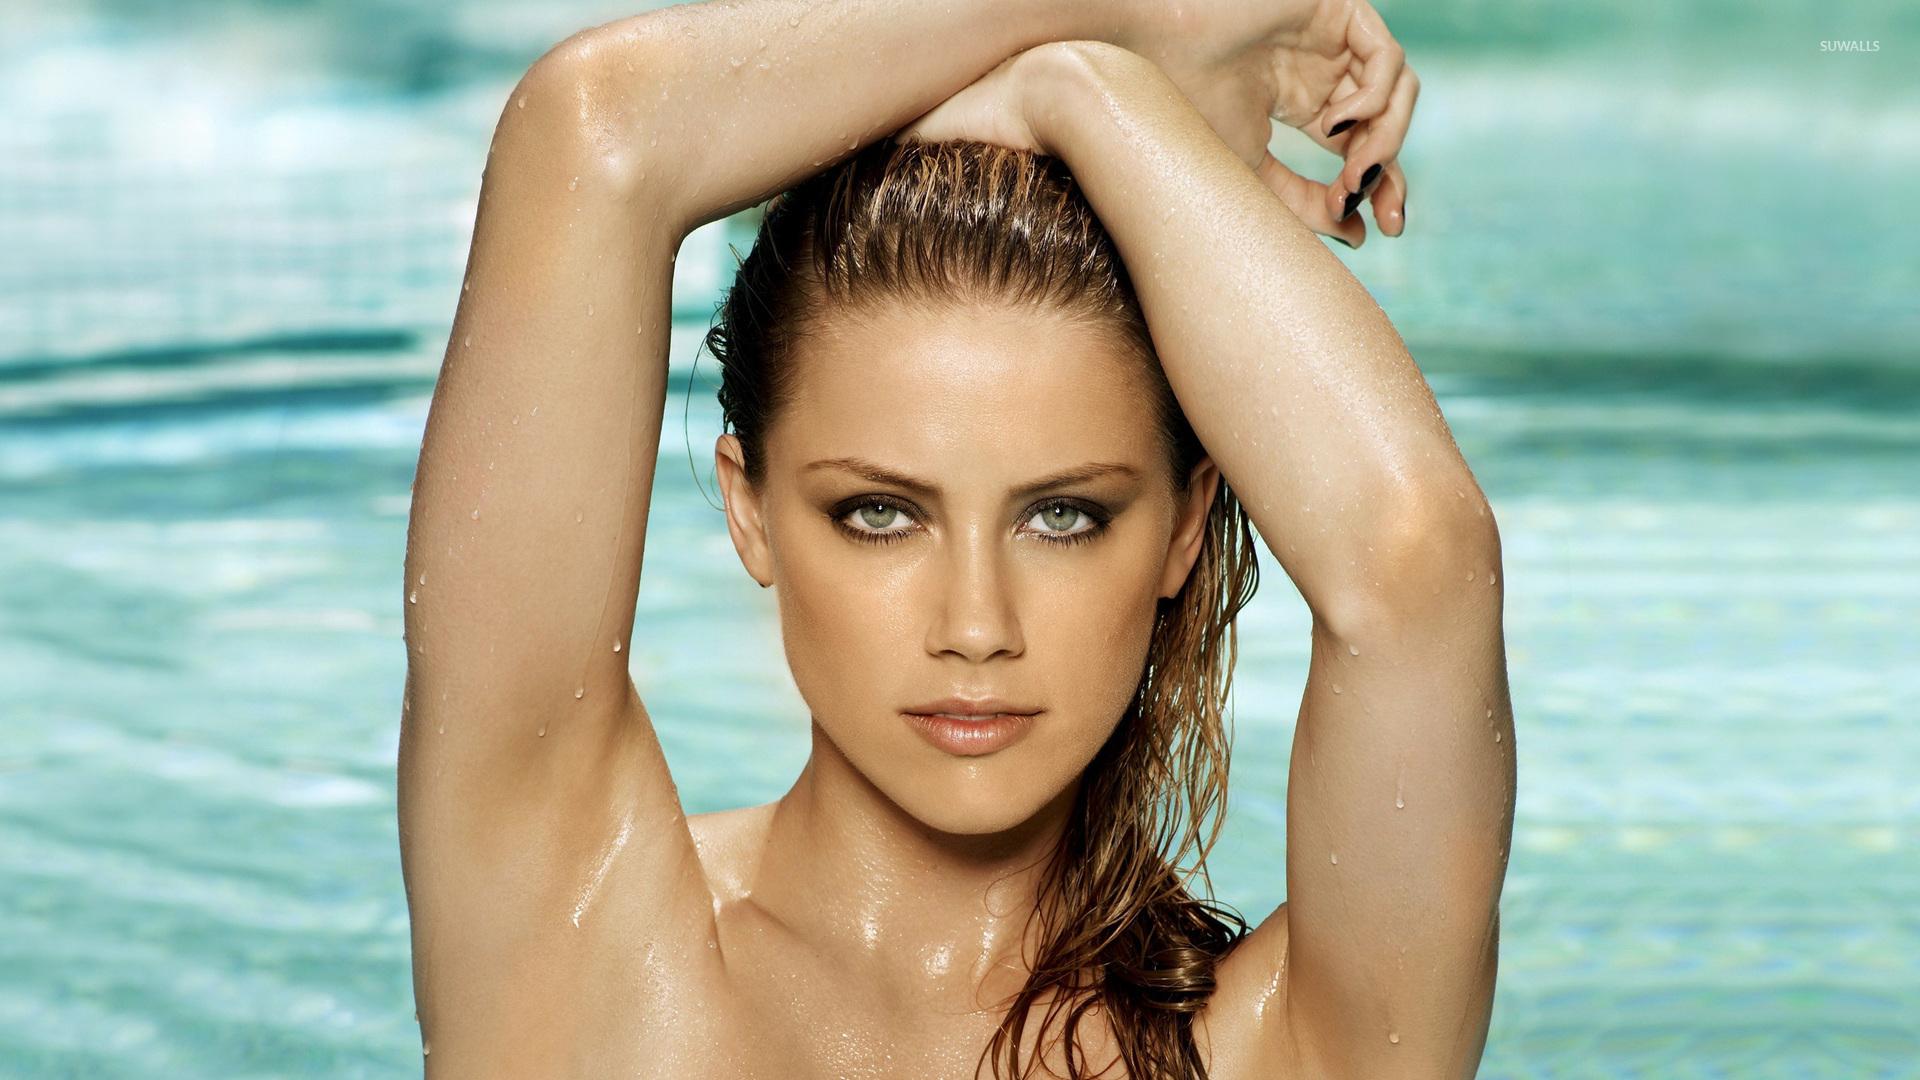 Amber Heard Hot Nude 74+] amber heard wallpapers on wallpapersafari